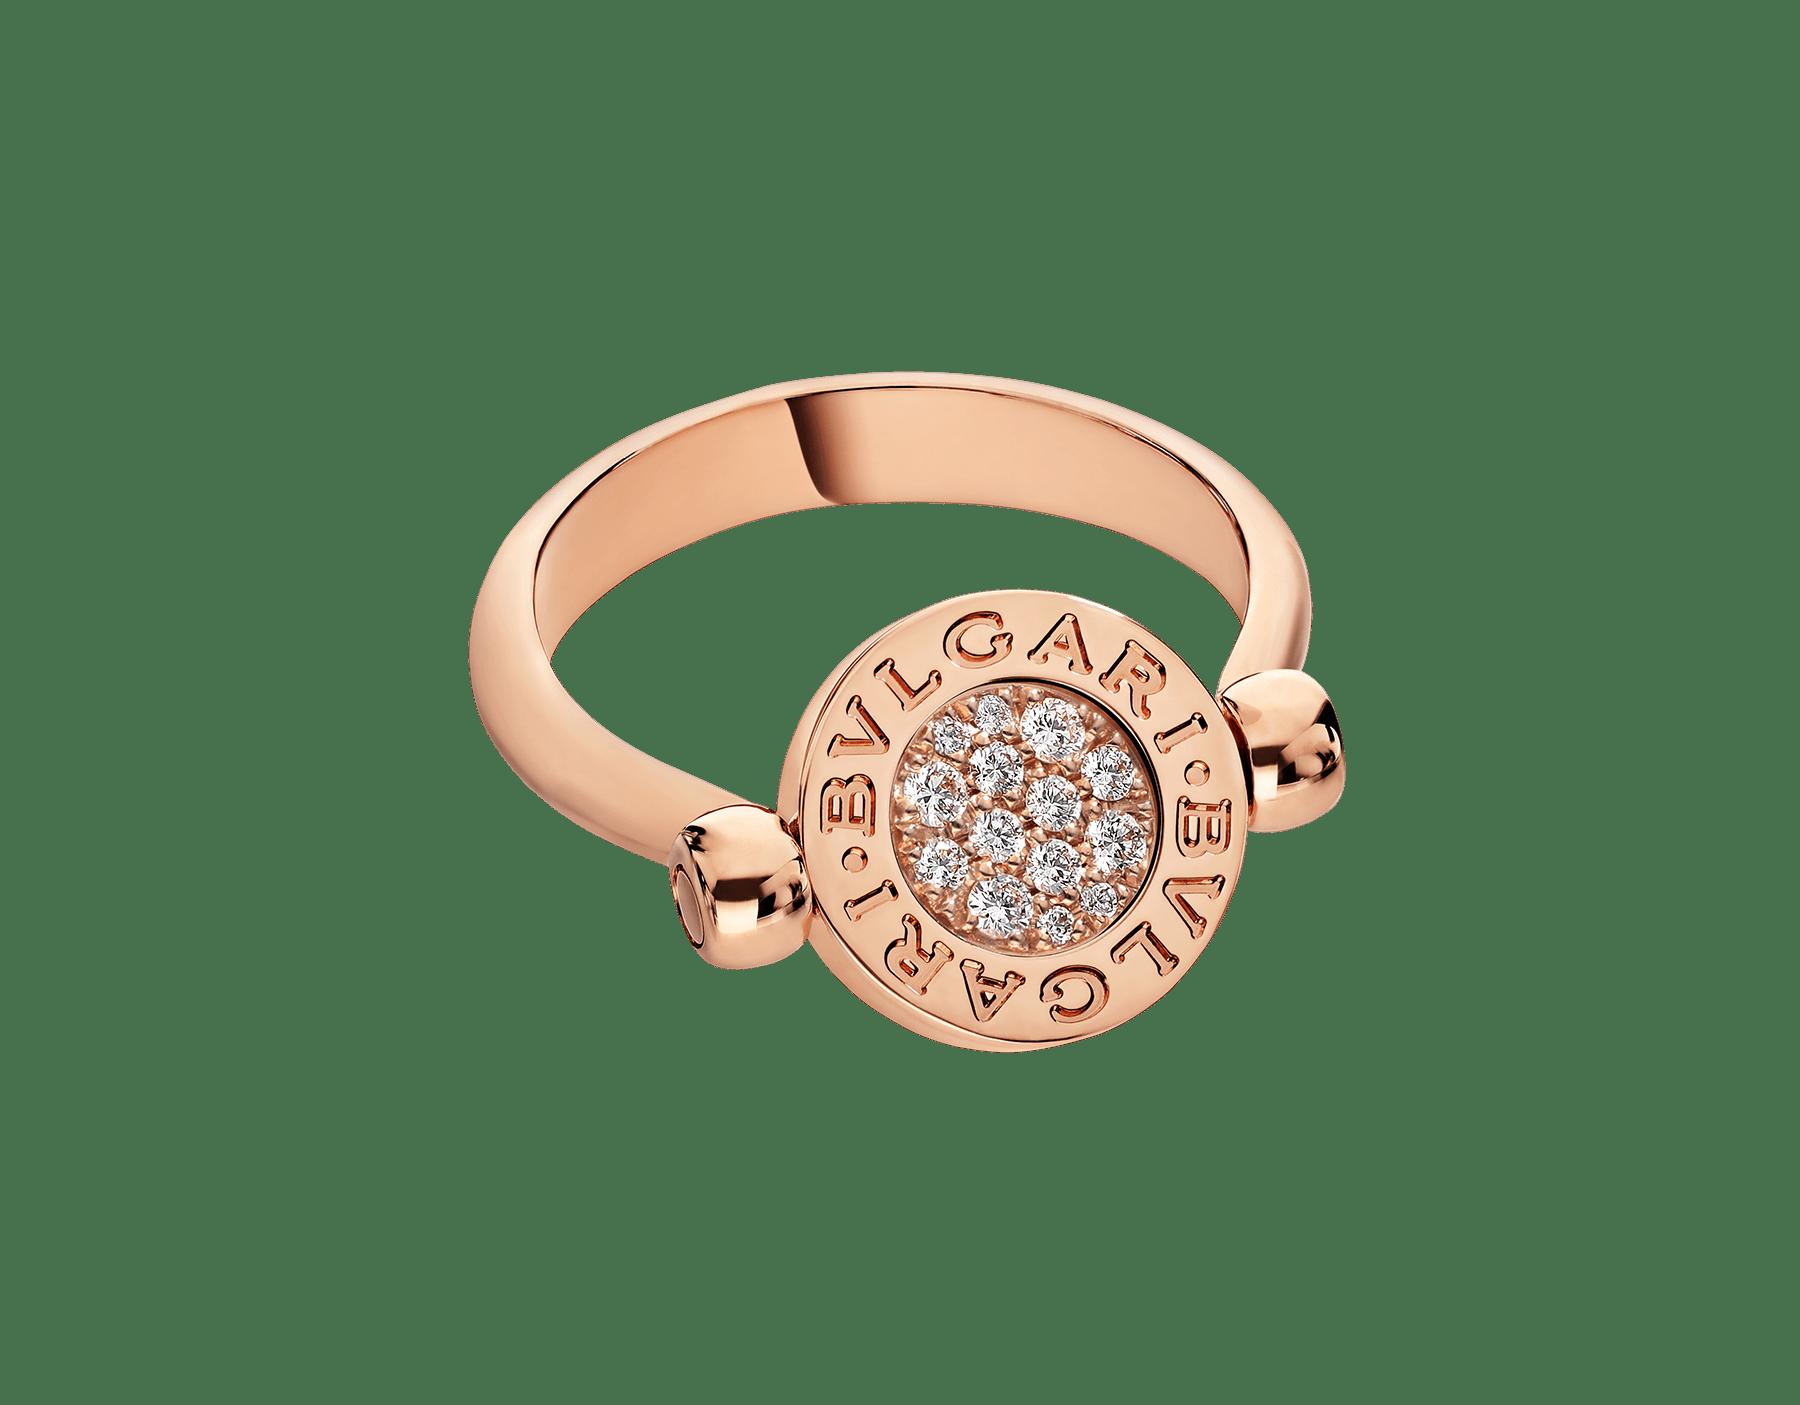 BVLGARI BVLGARI 18 kt rose gold flip ring set with green jade and pavé diamonds AN857356 image 4